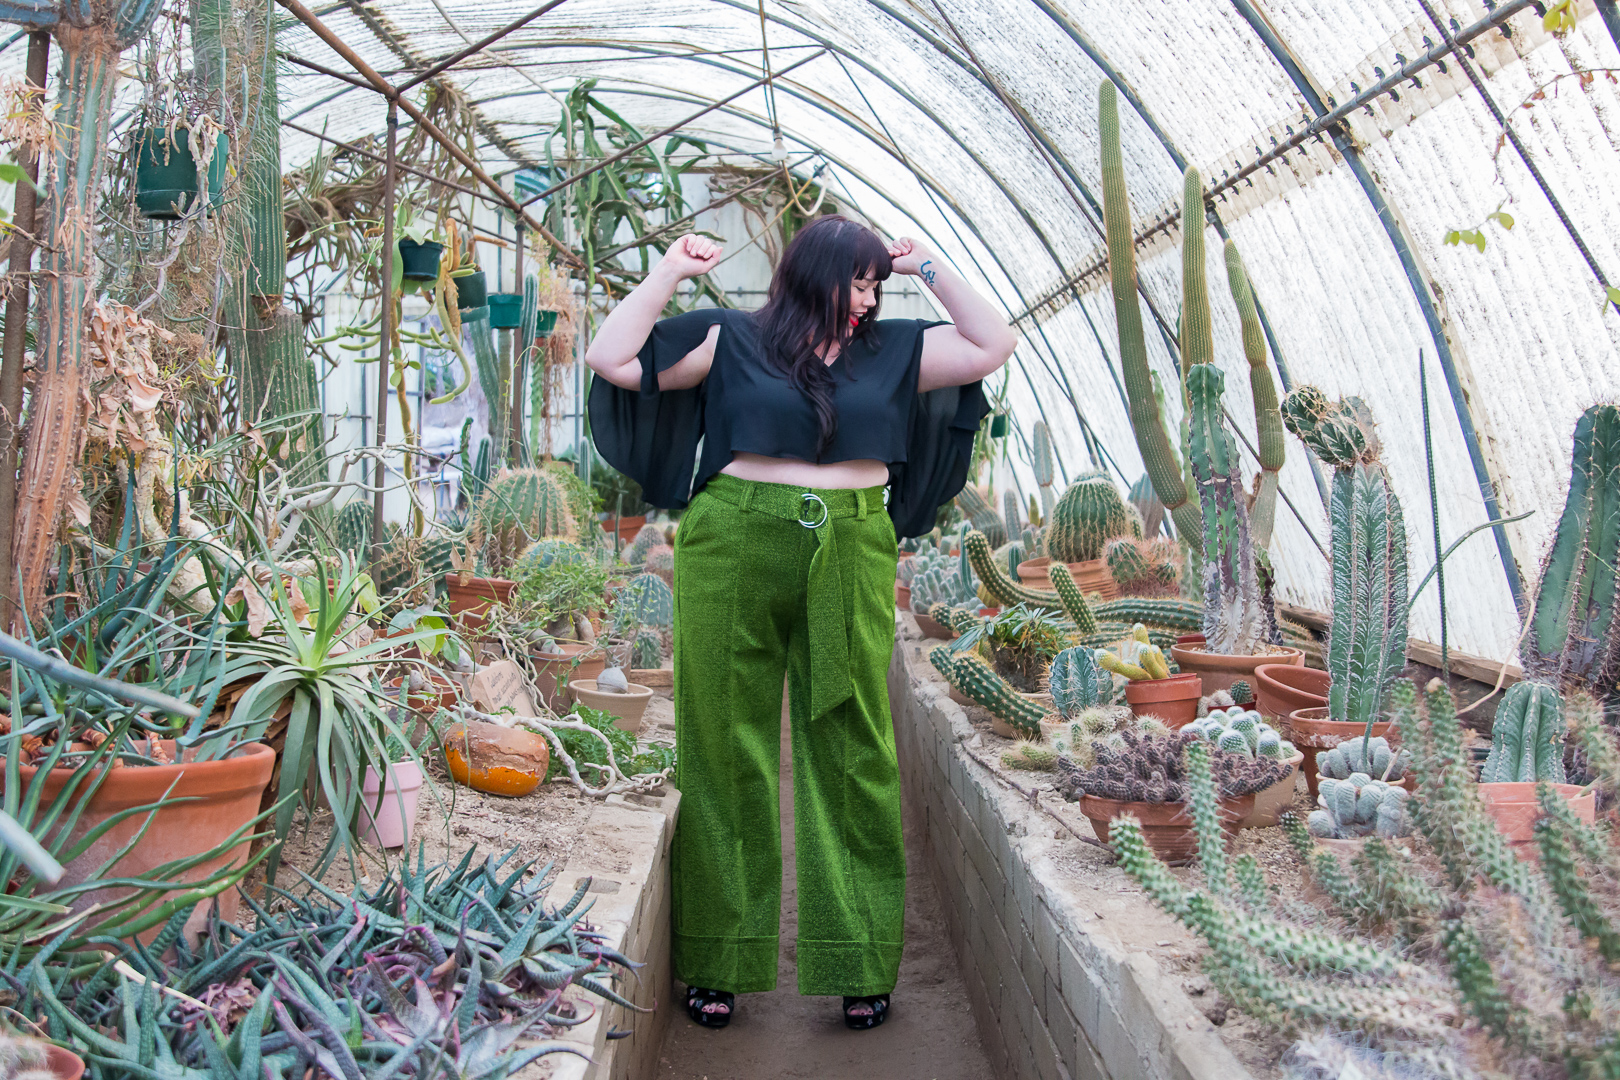 Cactus Garden Photo Shoot, Top Fashion Blogger, Plus Size Influencer